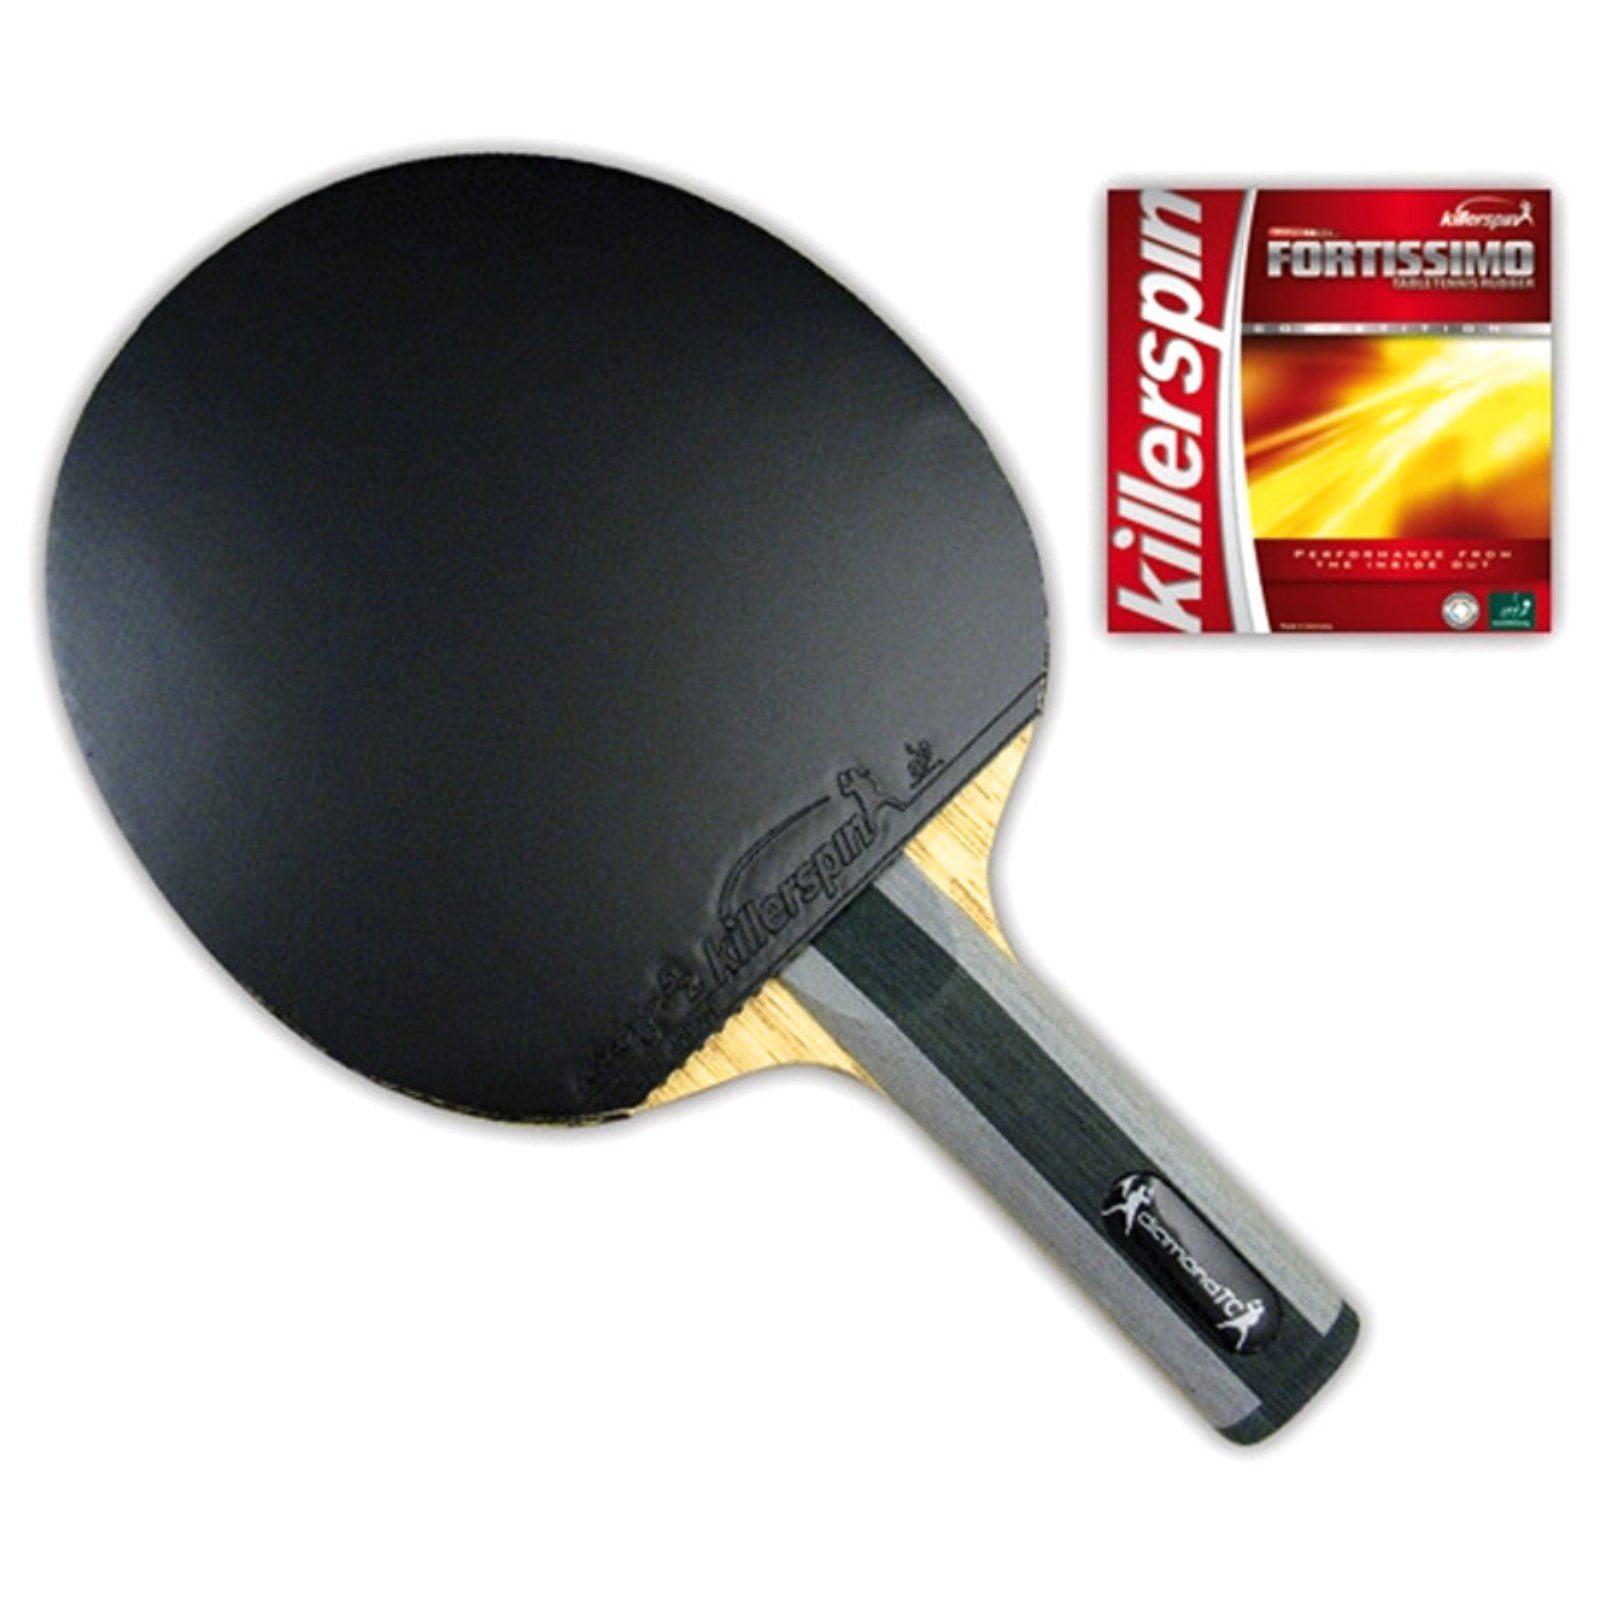 Killerspin RTG Diamond TC Premium Table Tennis Paddle